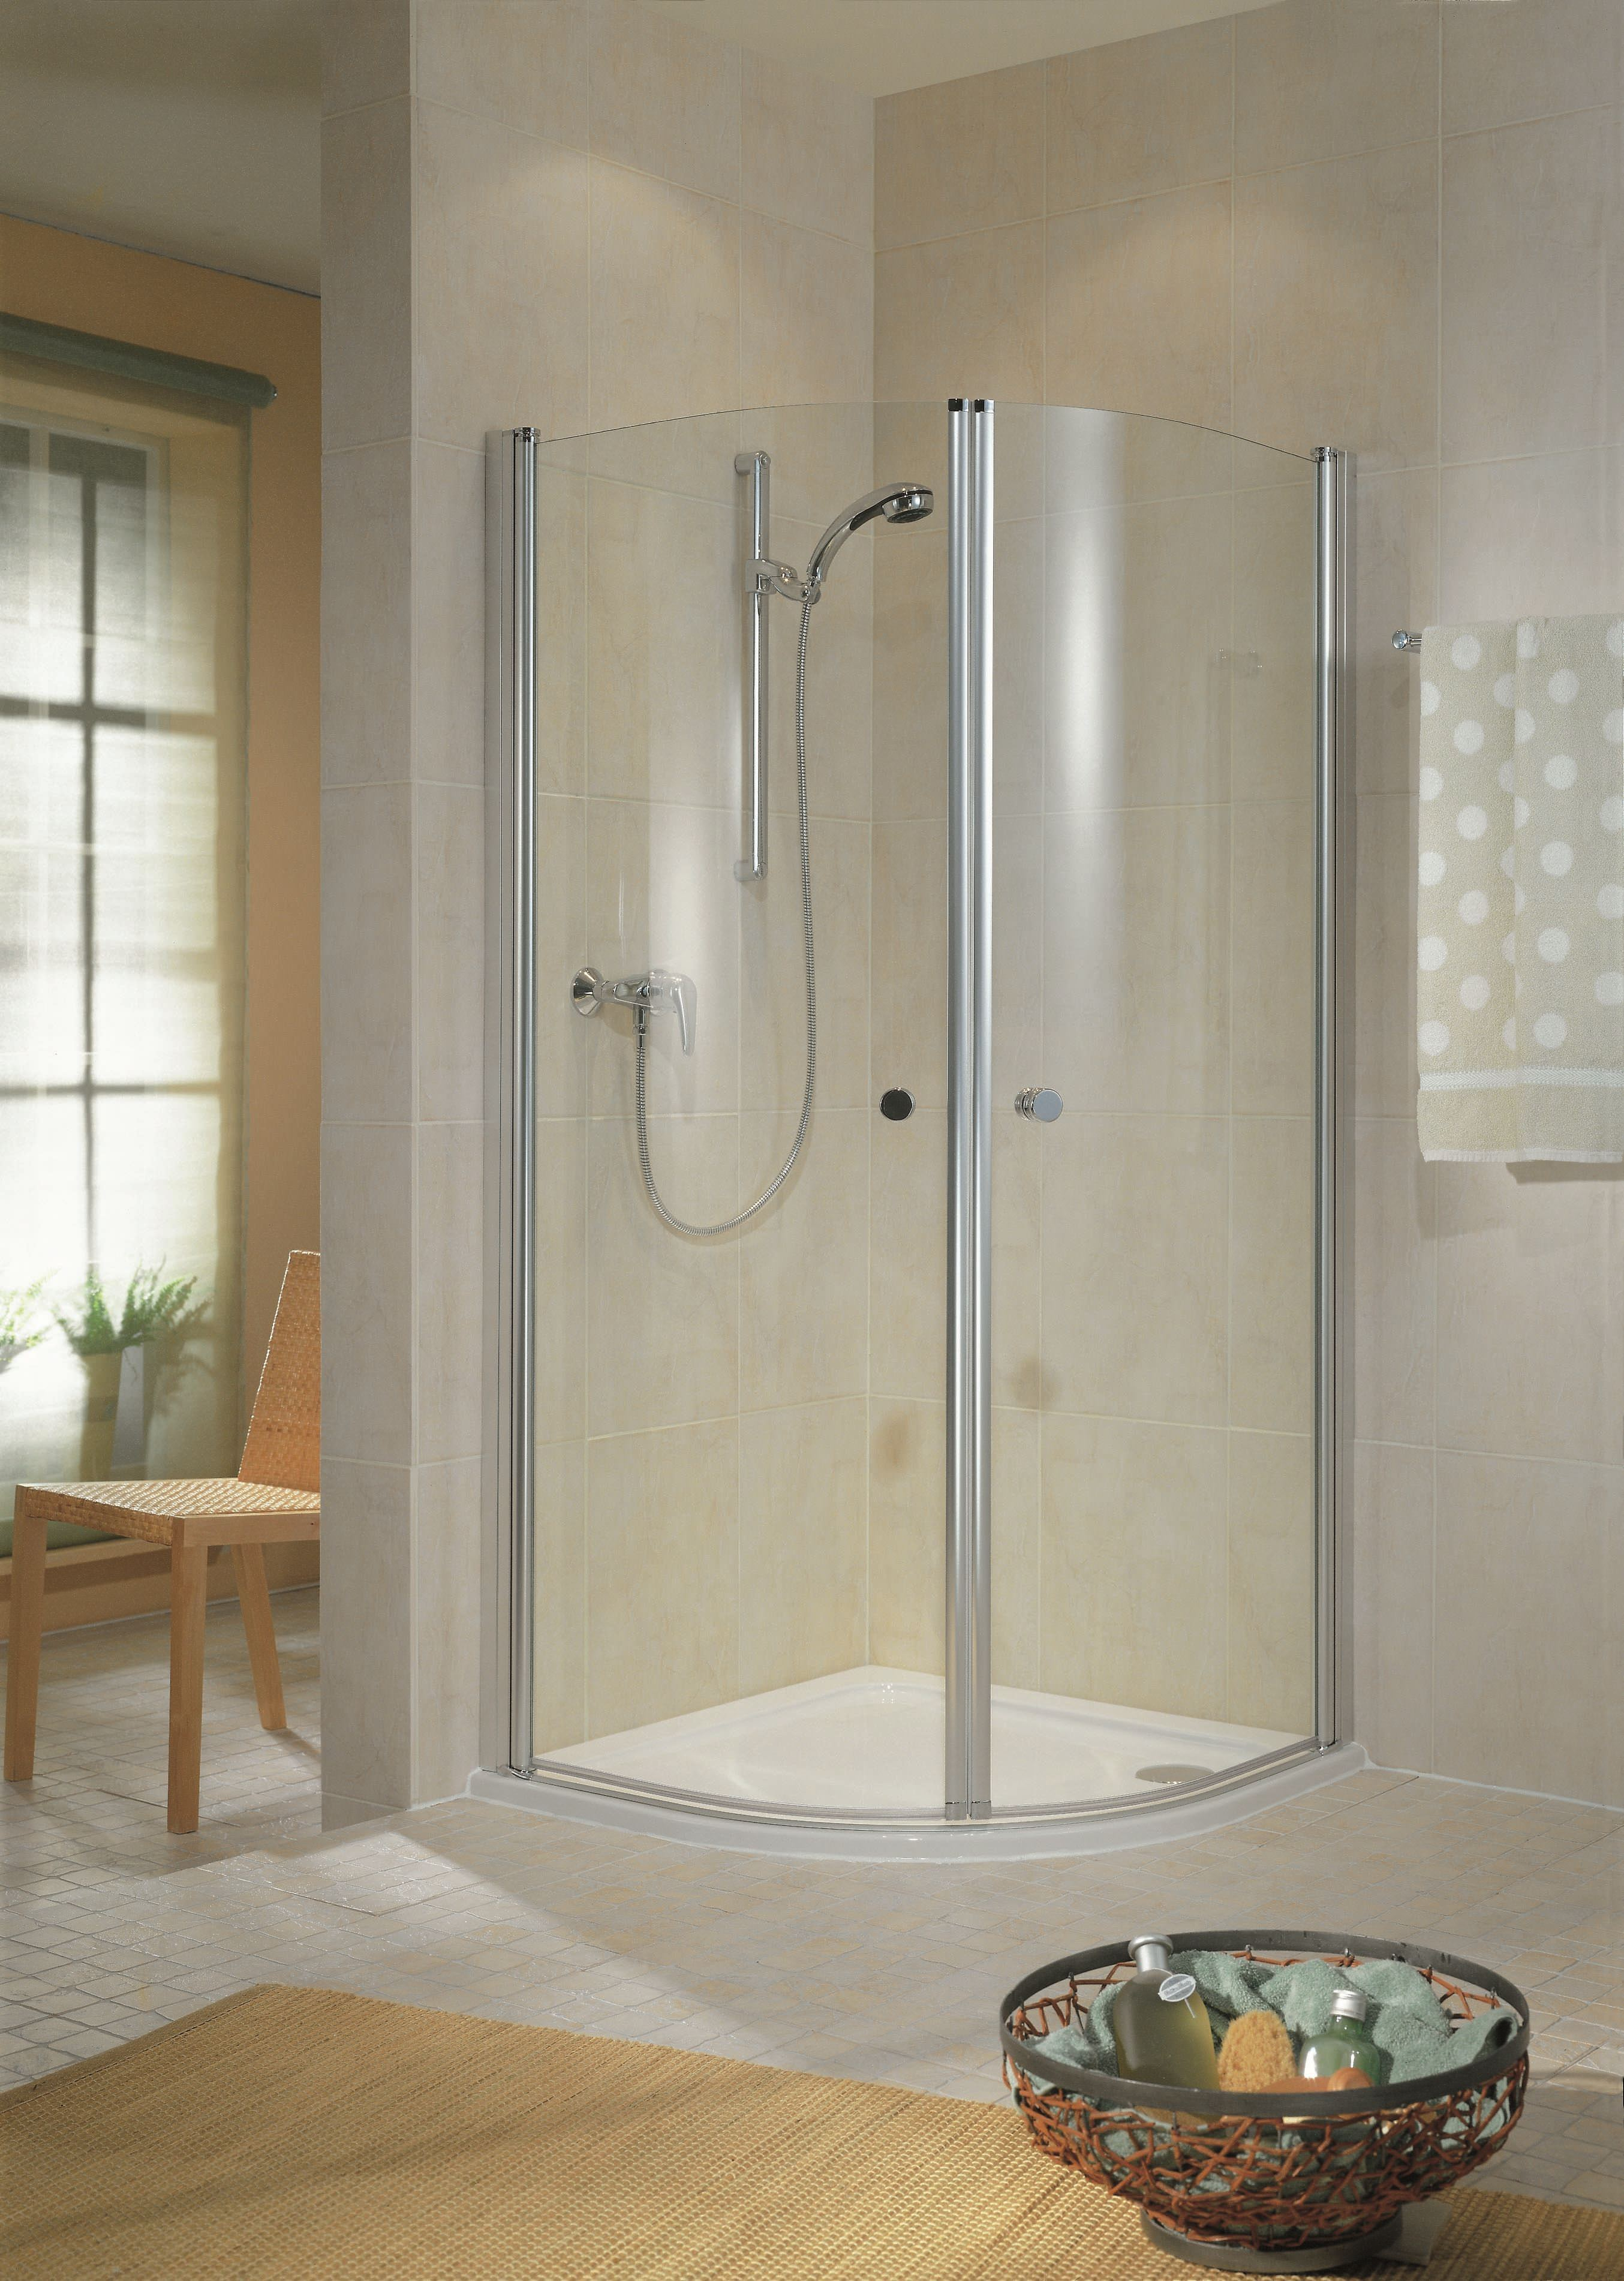 schulte garant runddusche bella 2 teilig echtglas d83206. Black Bedroom Furniture Sets. Home Design Ideas